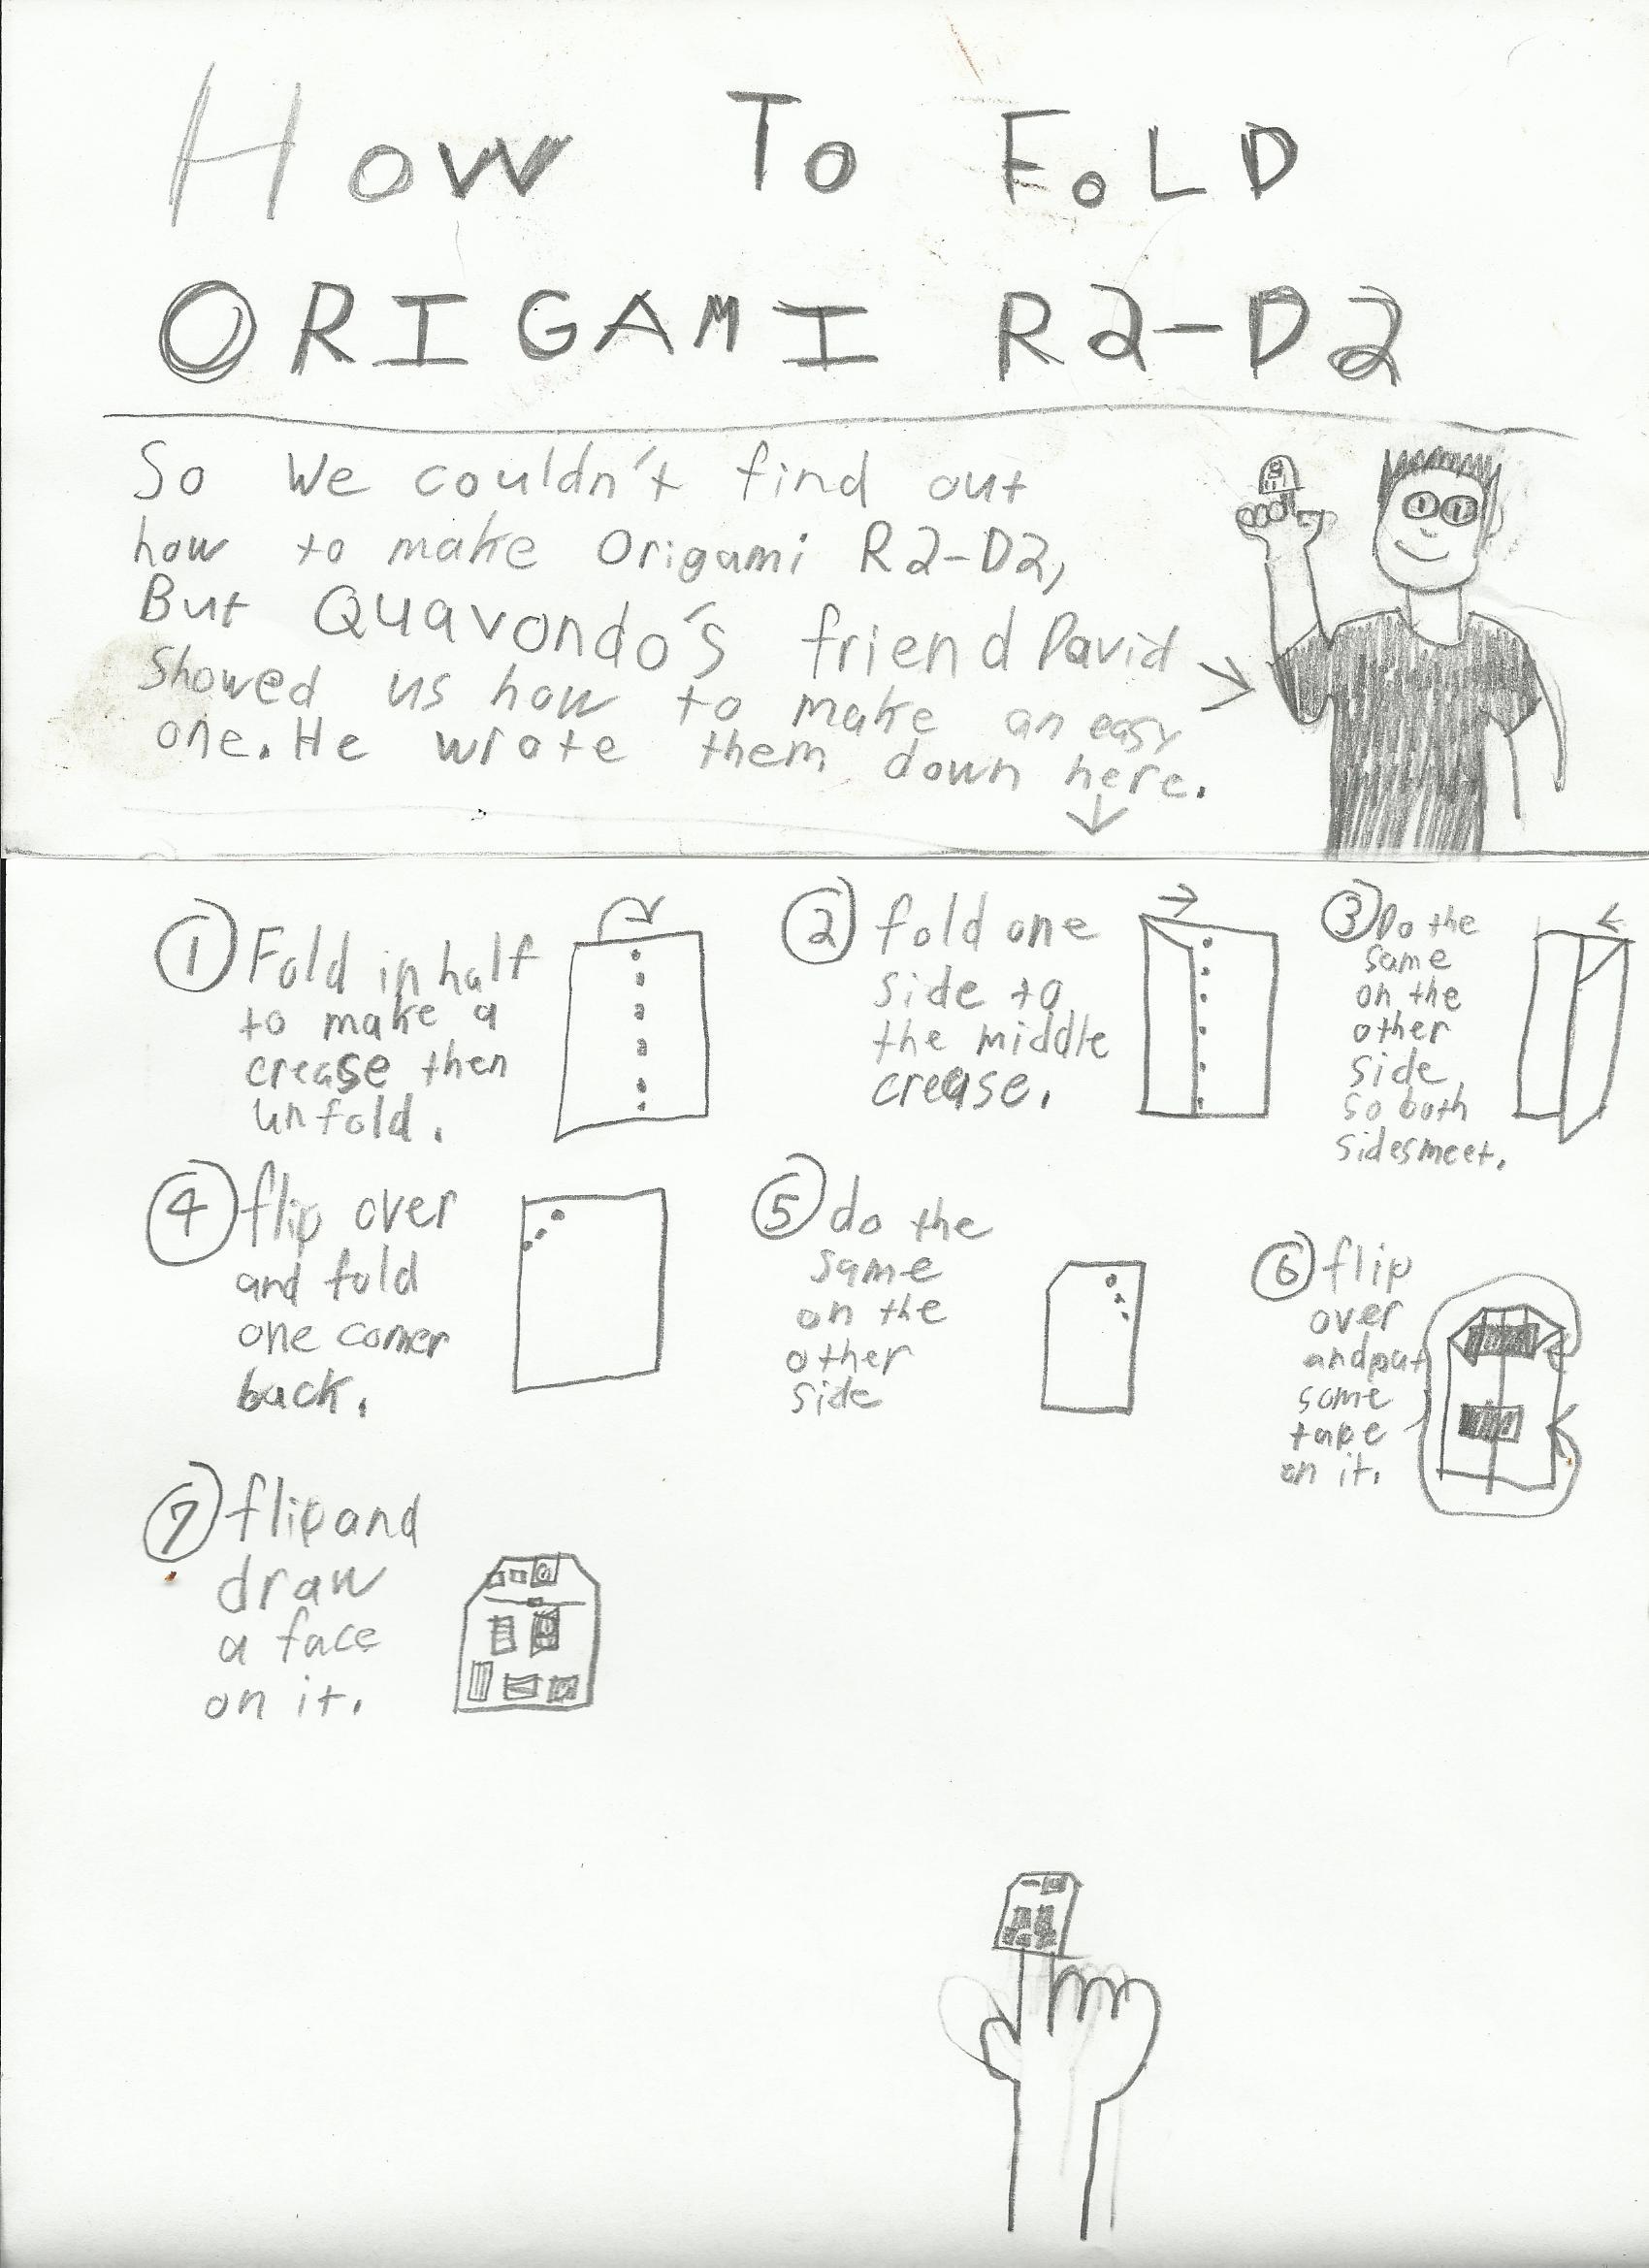 Origami R2d2 Finger Puppet Instructions